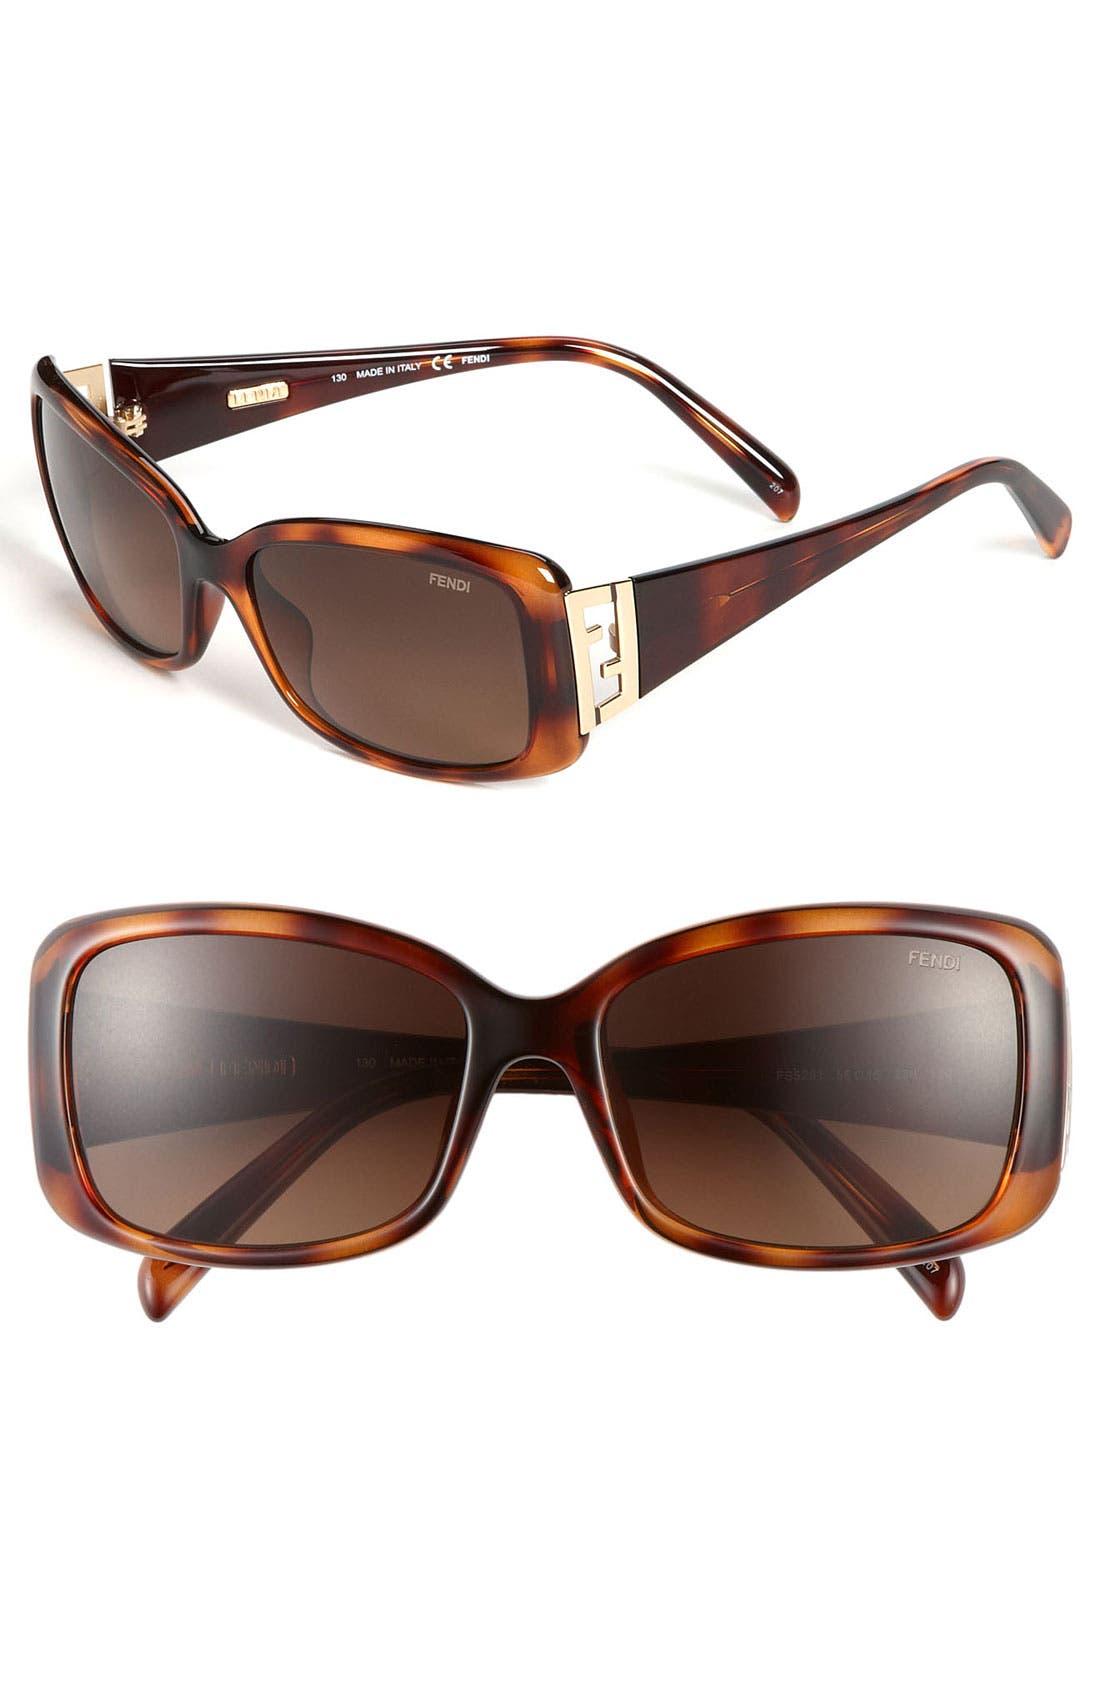 Alternate Image 1 Selected - Fendi 'Double F' 56mm Sunglasses